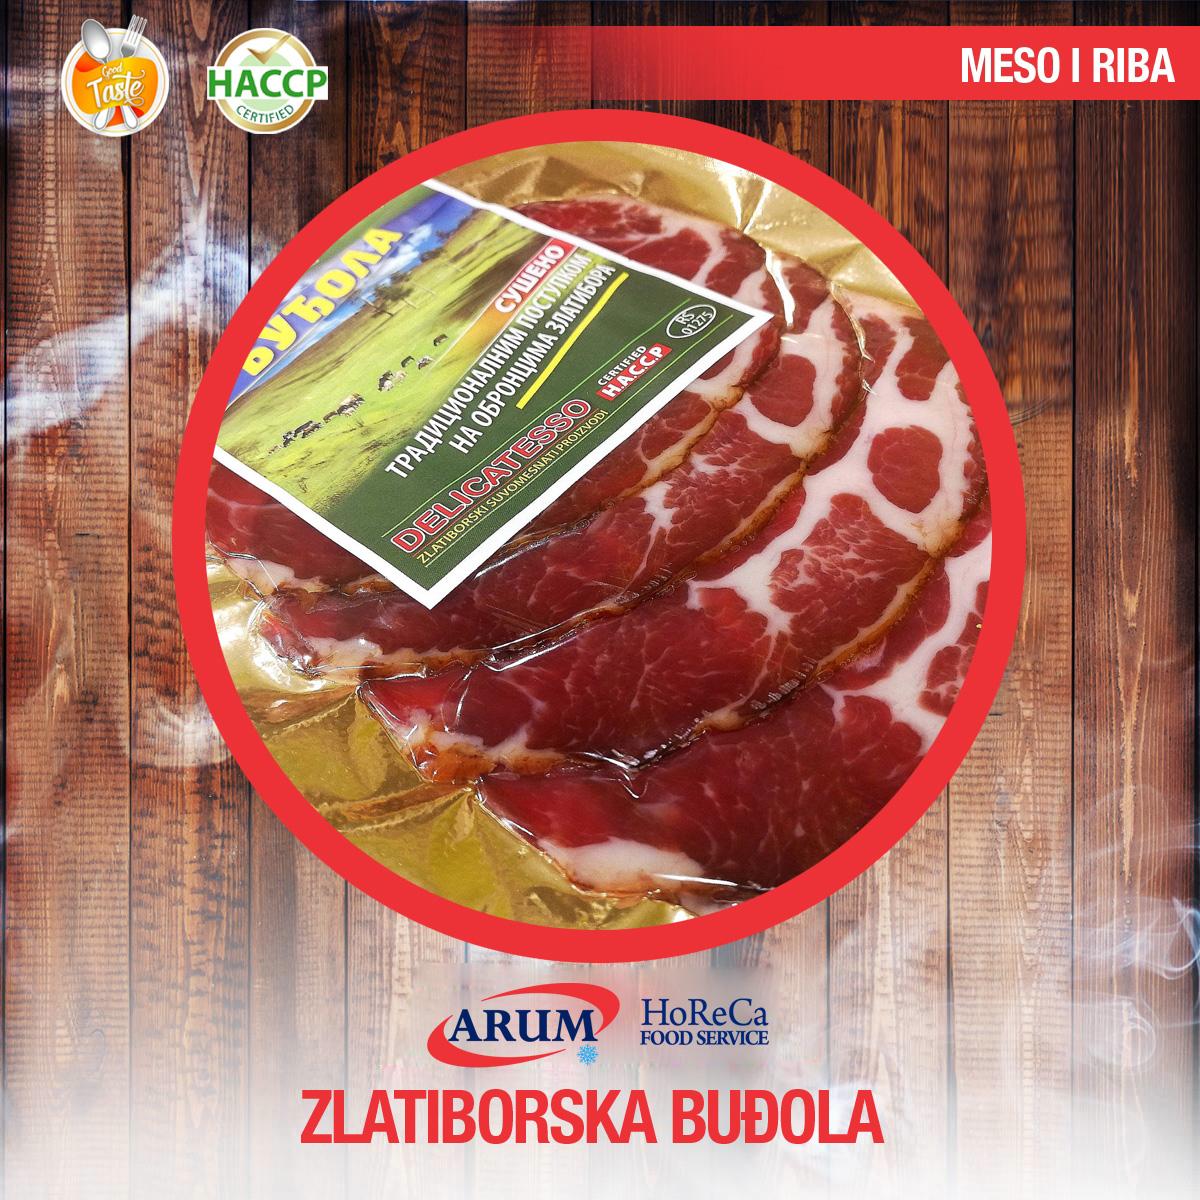 Zlatiborska budjola 250g slice (10/#)